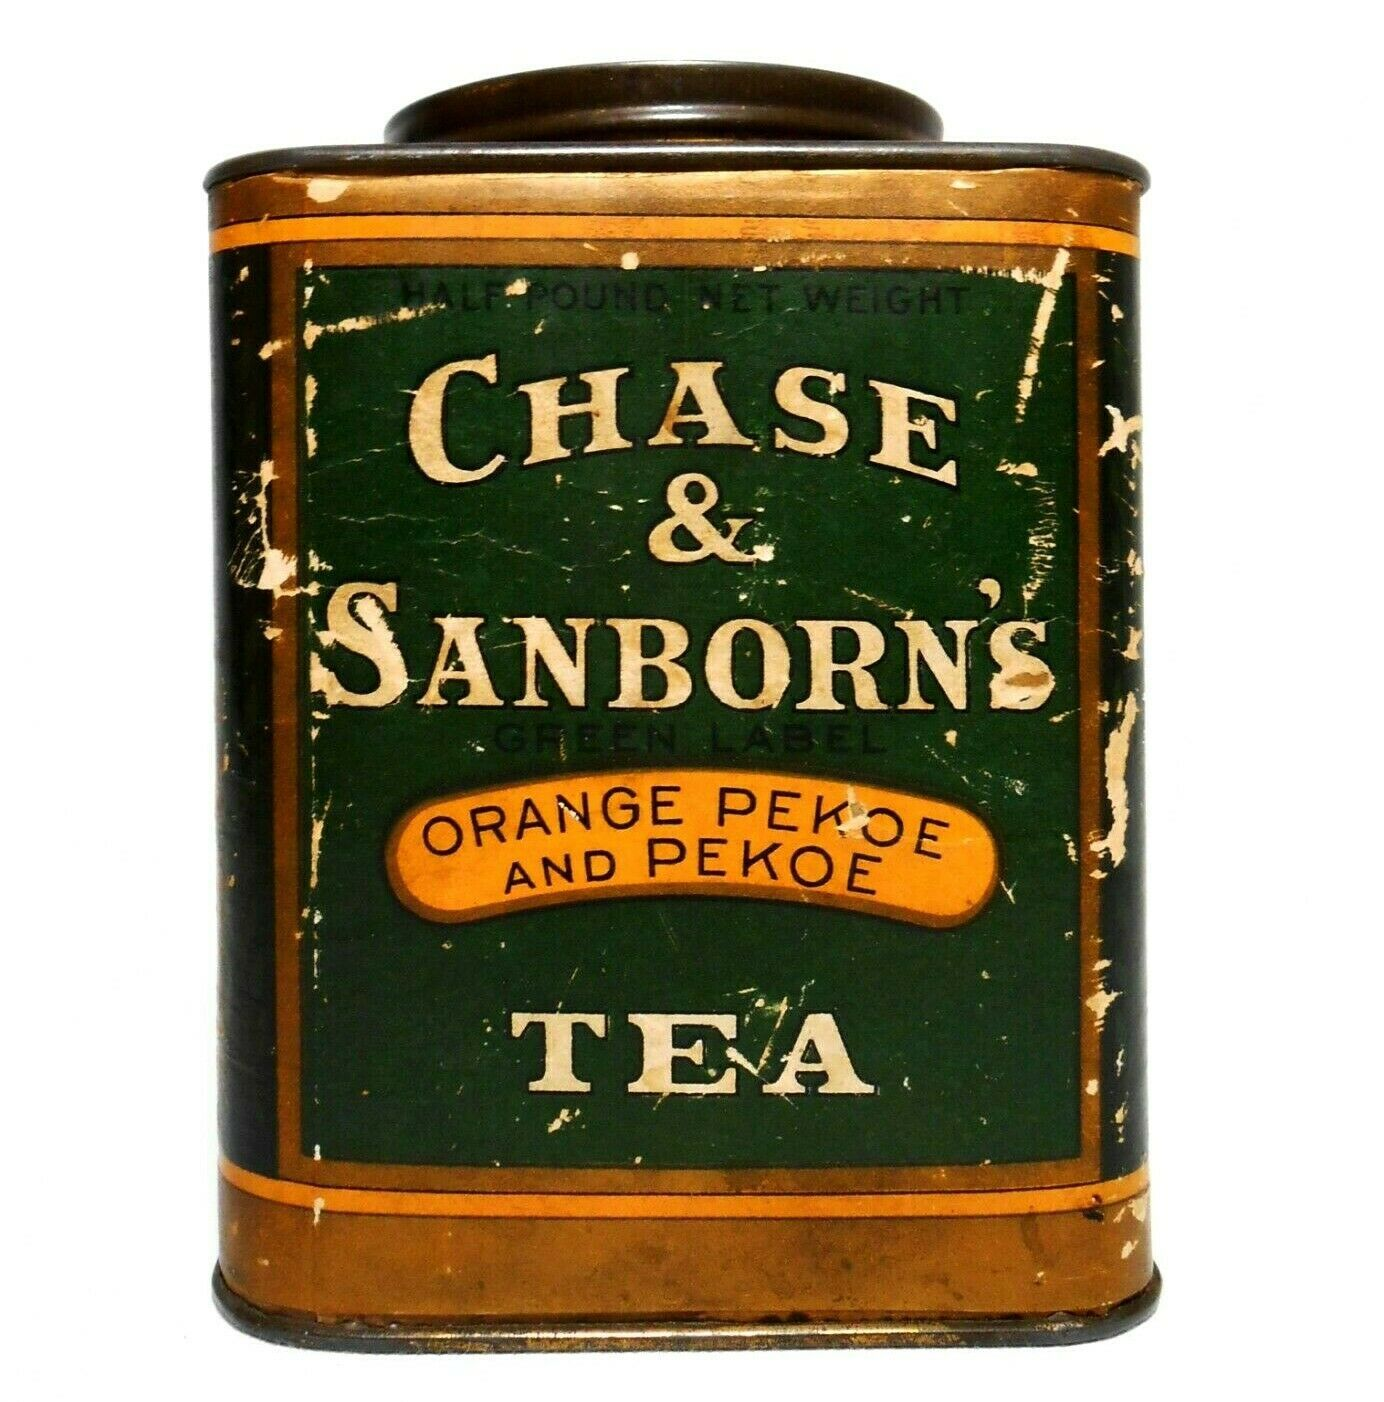 Early 20th C Vint Chase Sanborn S Orange Pekoe Black Tea Tin Can Paper Label 67 50 Orange Pekoe Tea